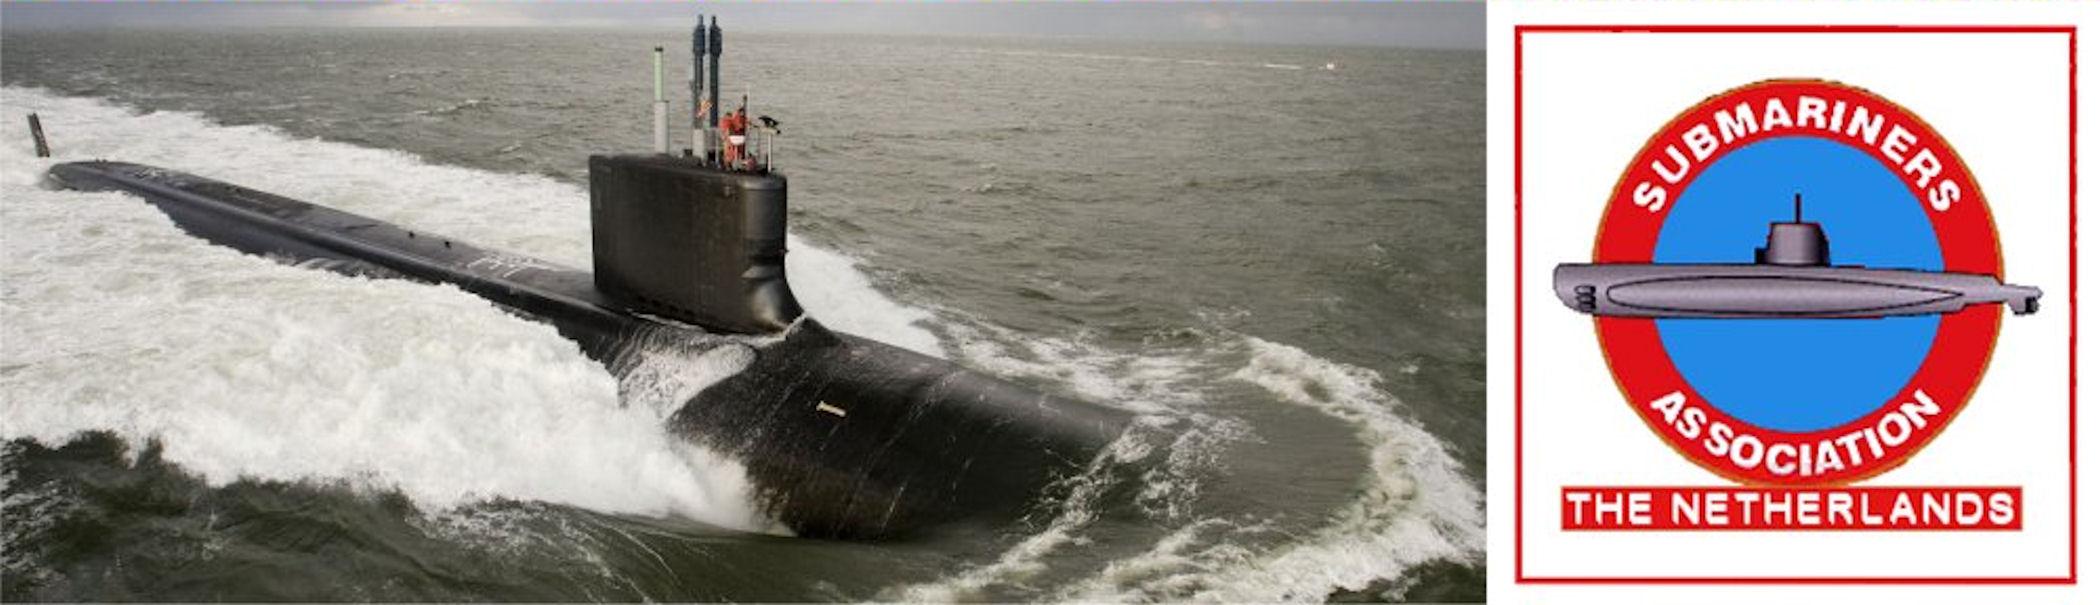 International Submariners Association-Banner